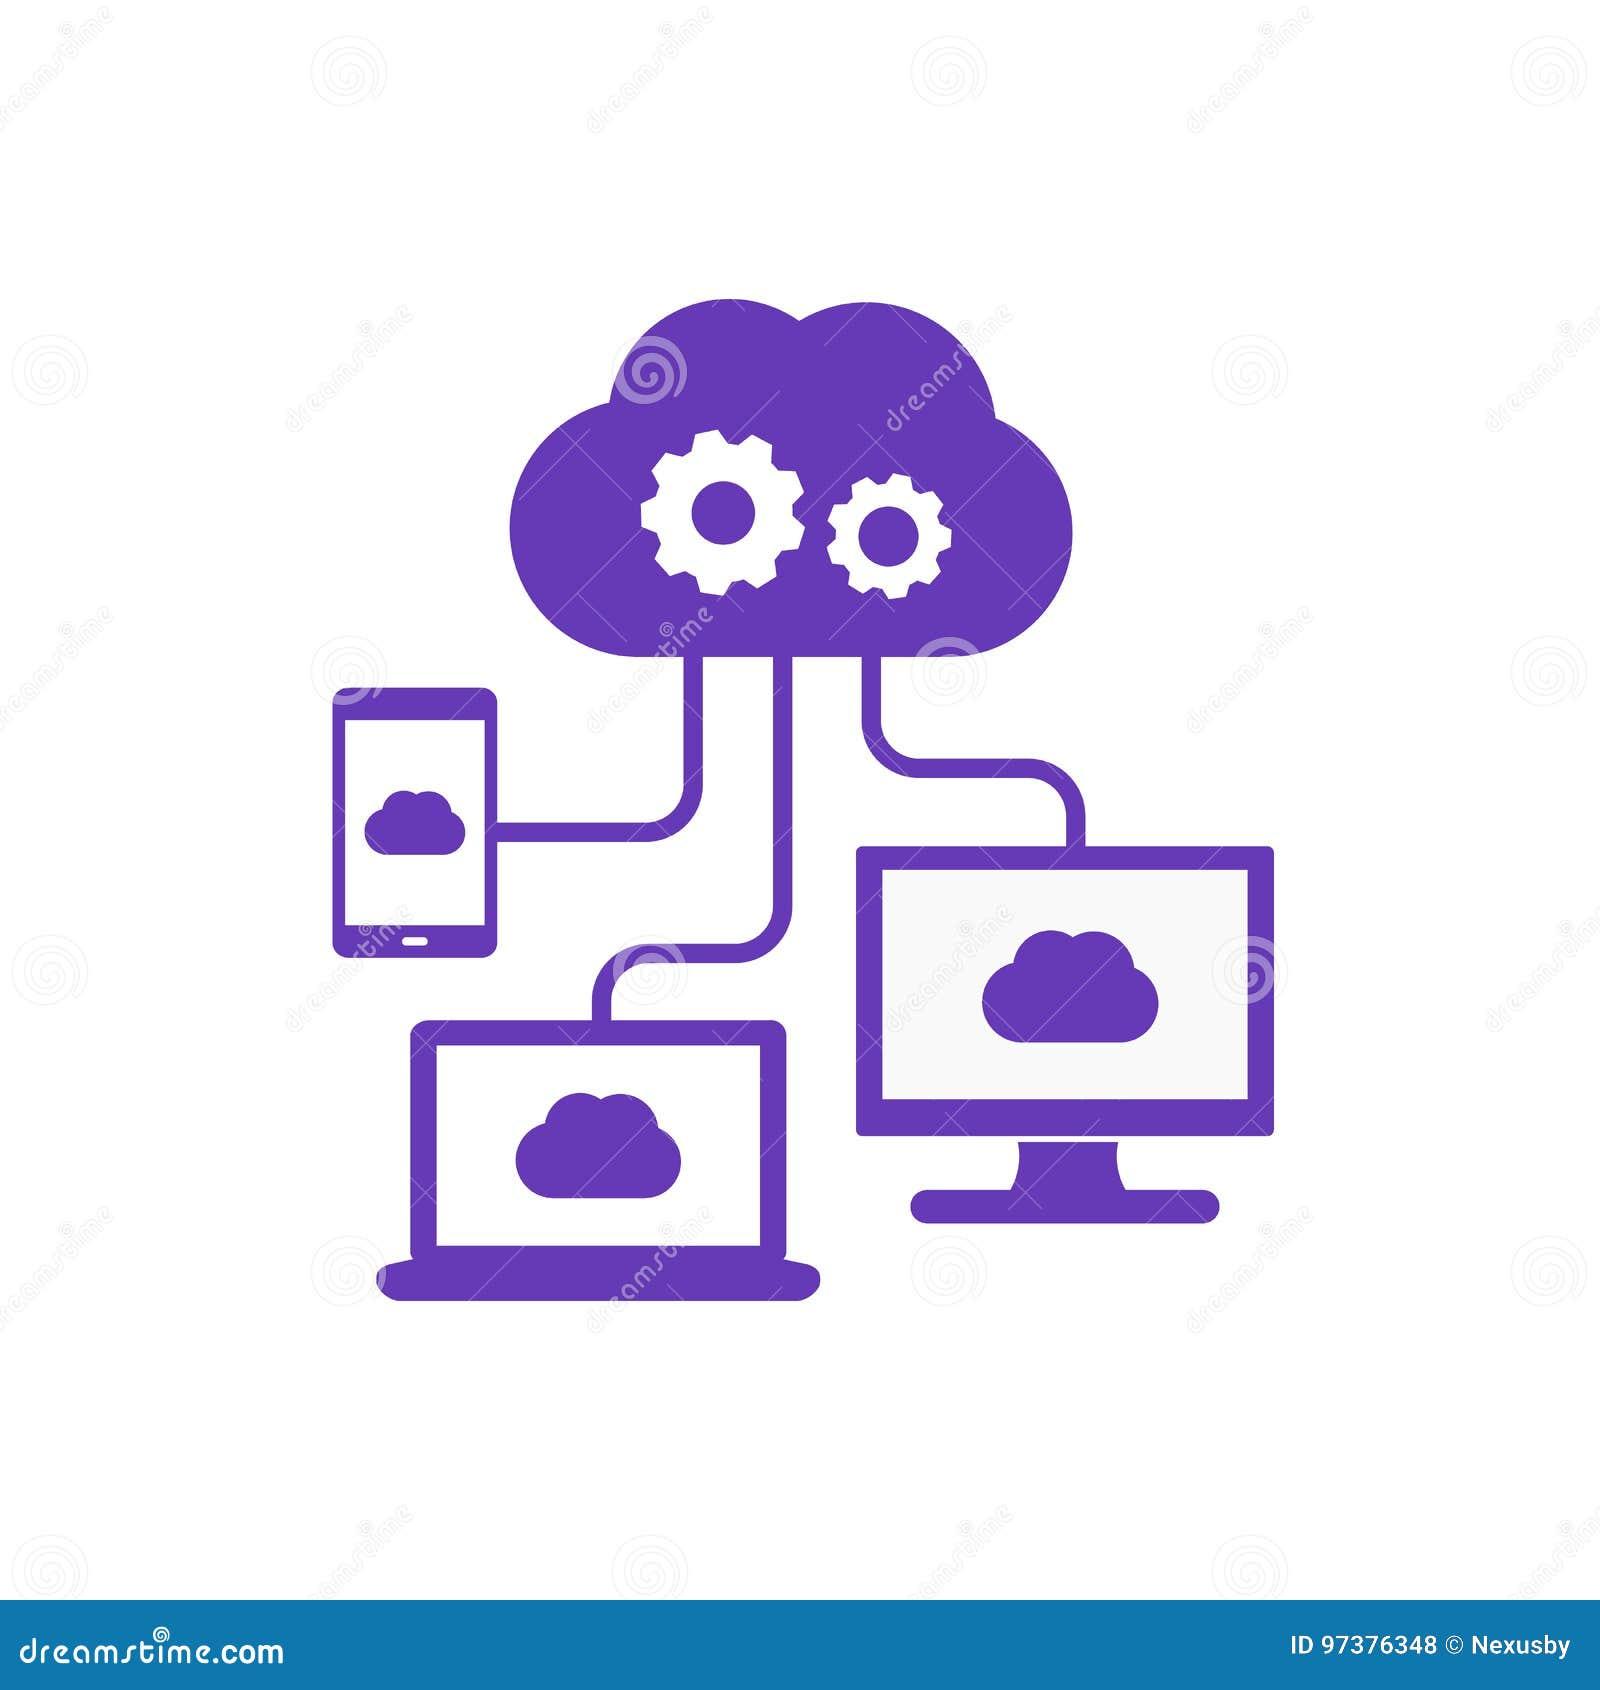 COmputing TechnologieS logo